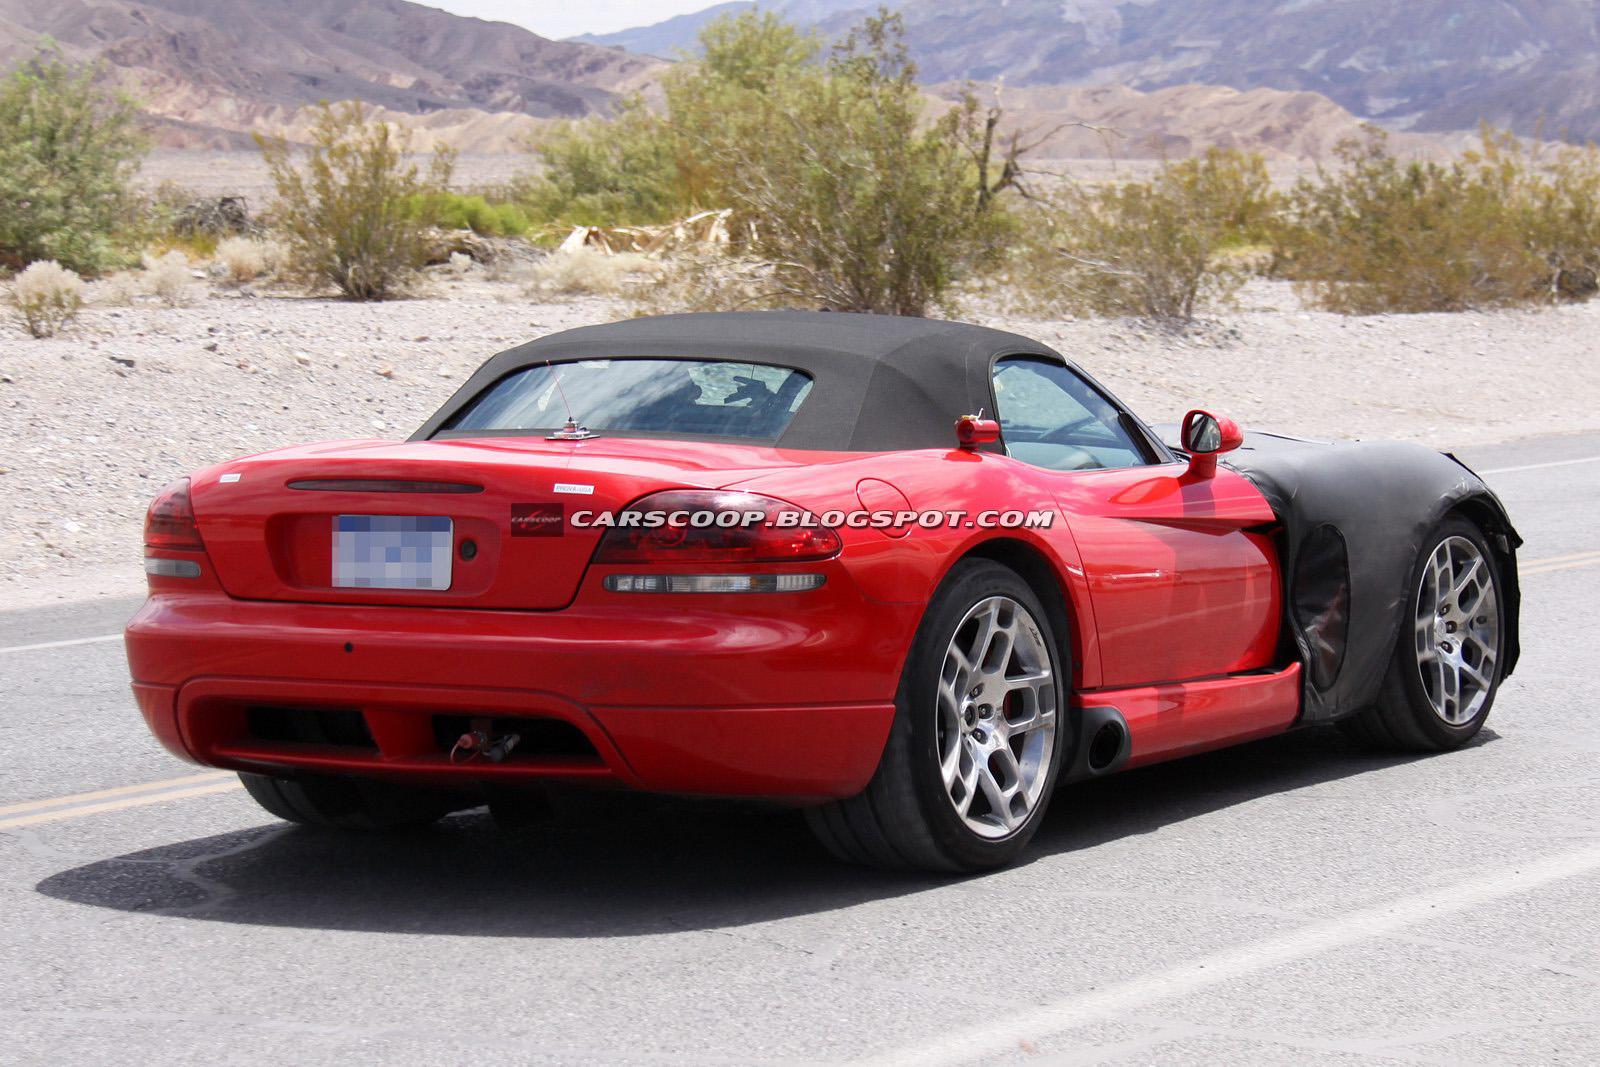 2013 Dodge Viper Spied again AmcarGuide